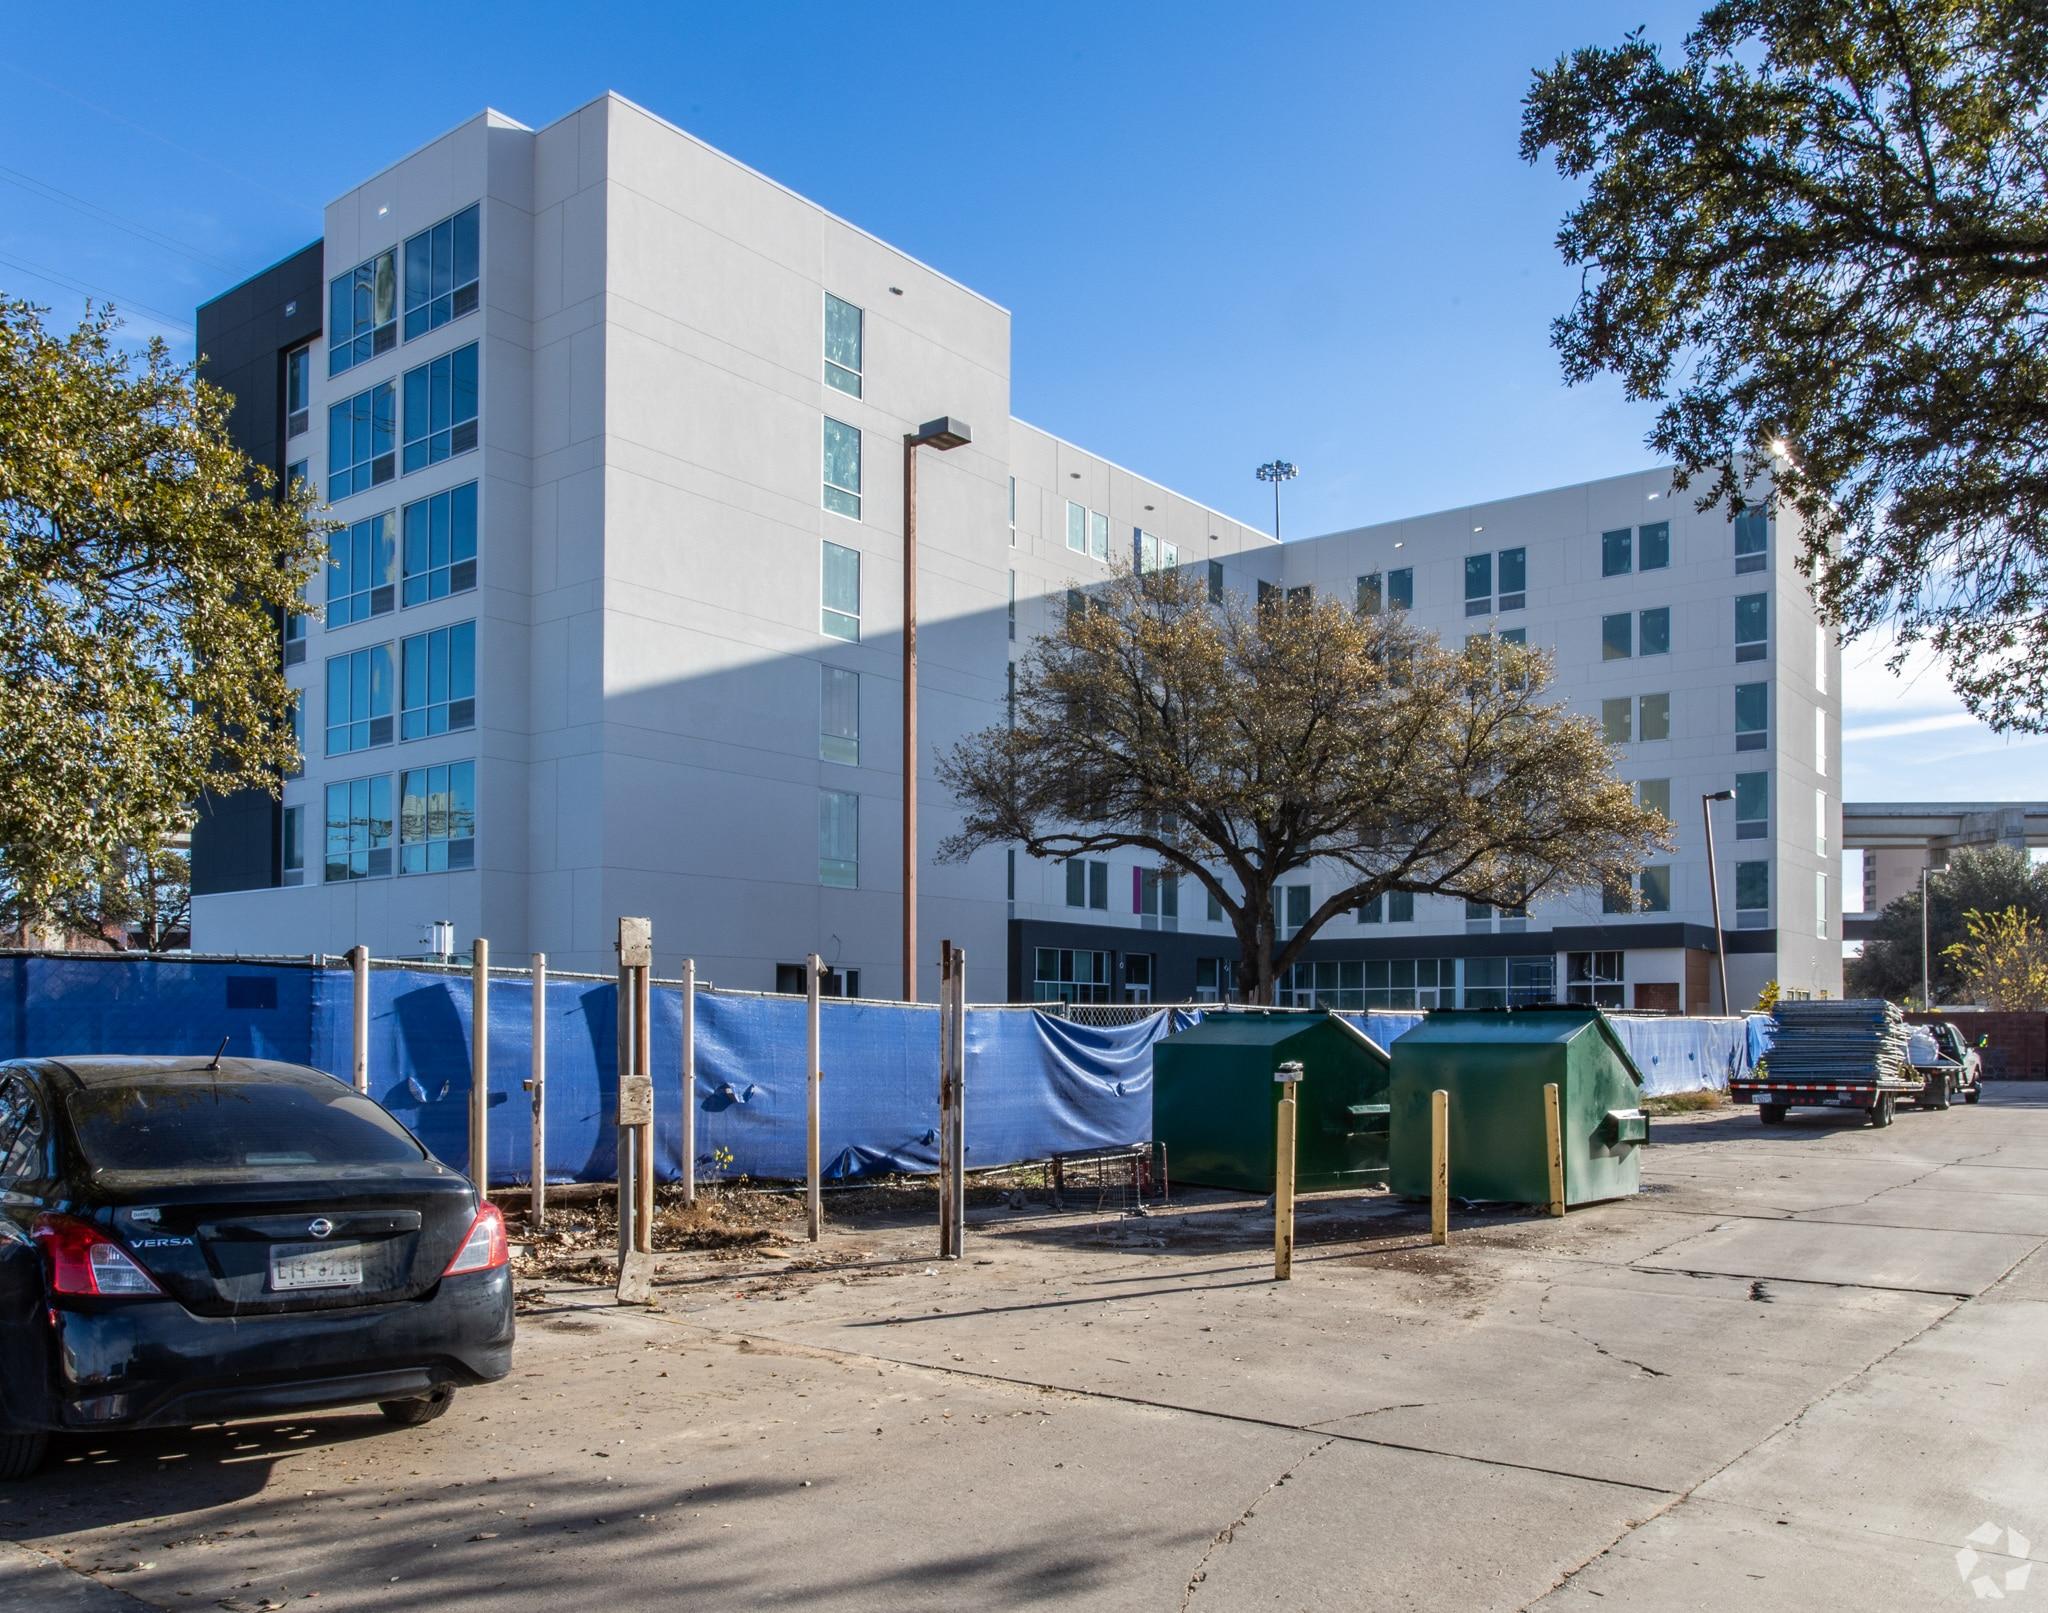 Aloft Hotel | South Austin Developments